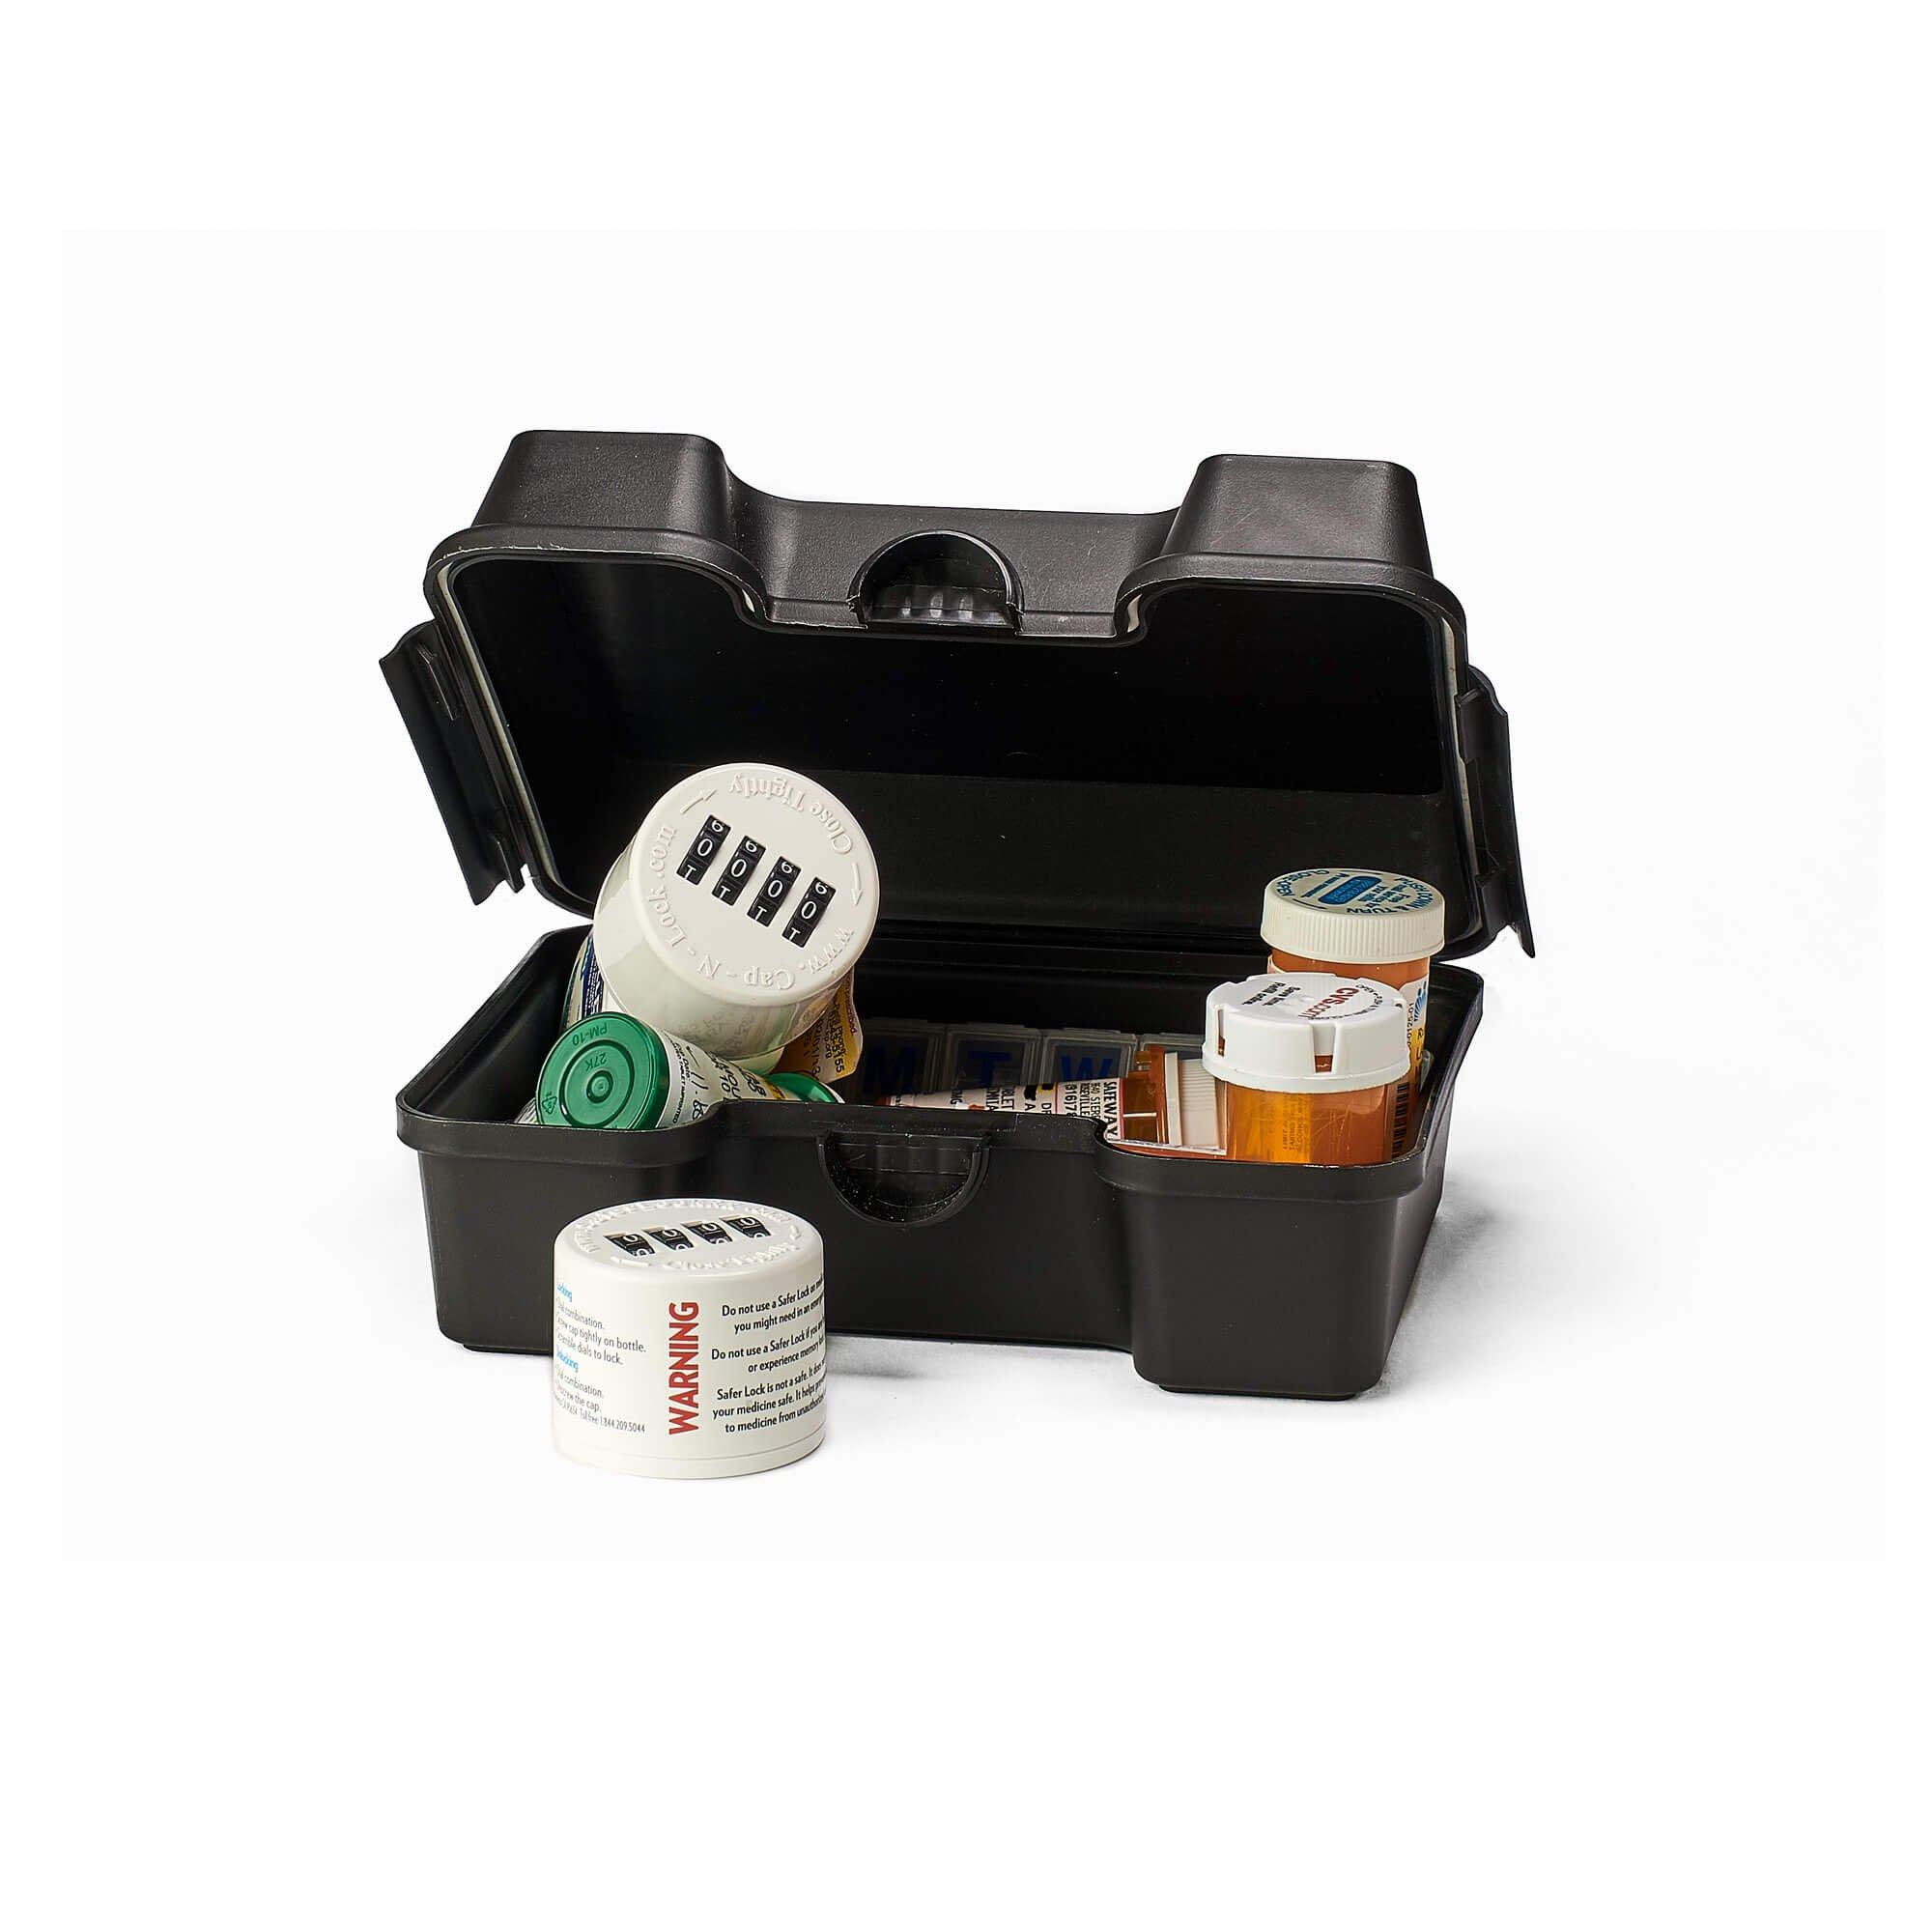 SaferLock Medication and Prescription Pill Lock Storage Box with Combination Lock, Black